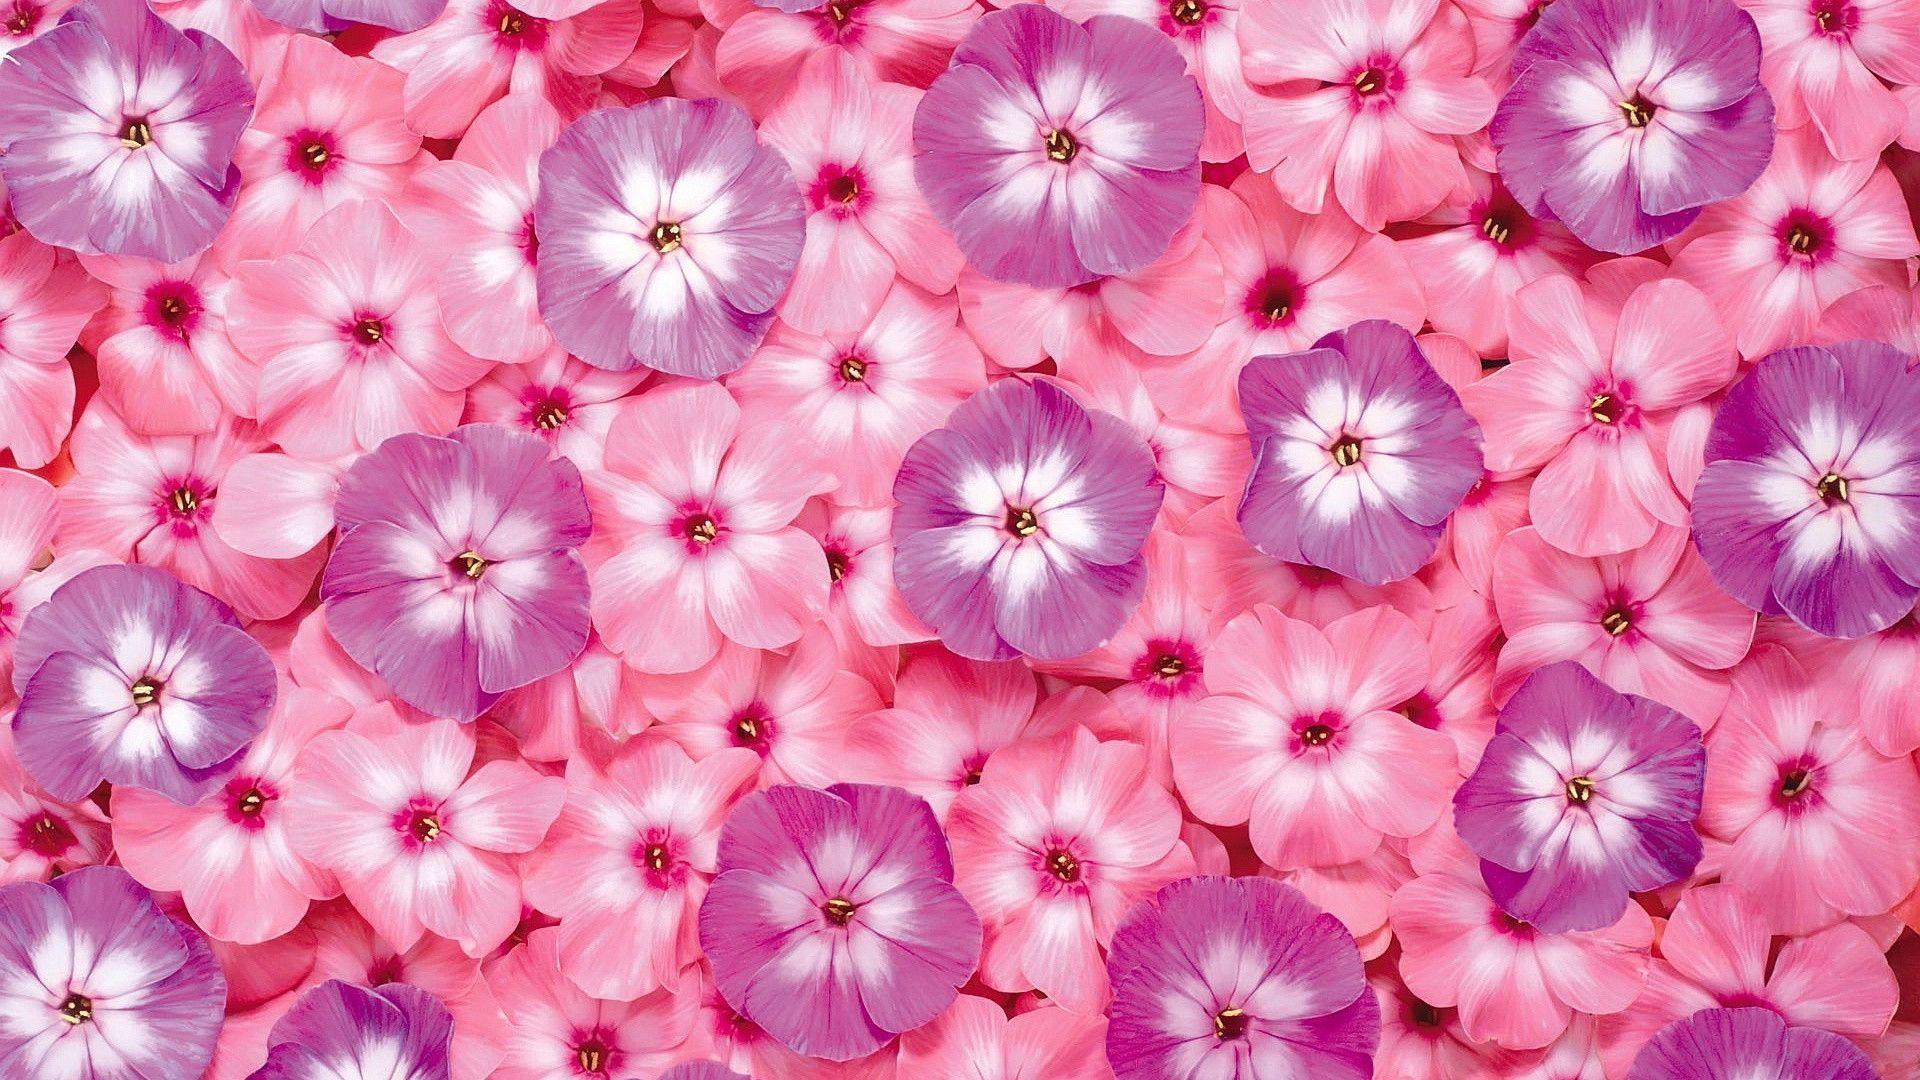 spring flower wallpaper pink - photo #43